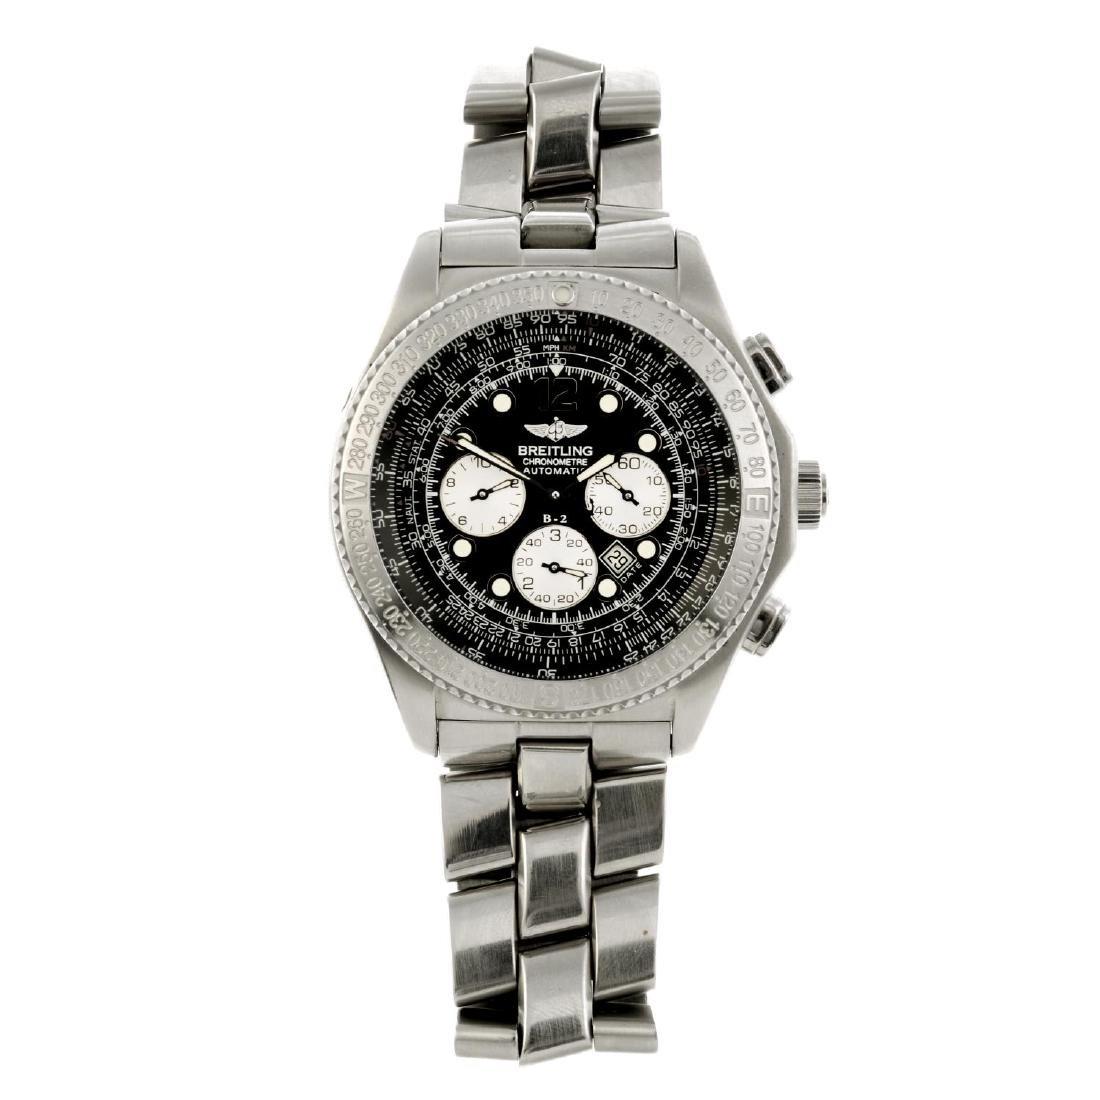 BREITLING - a gentleman's B-2 chronograph bracelet